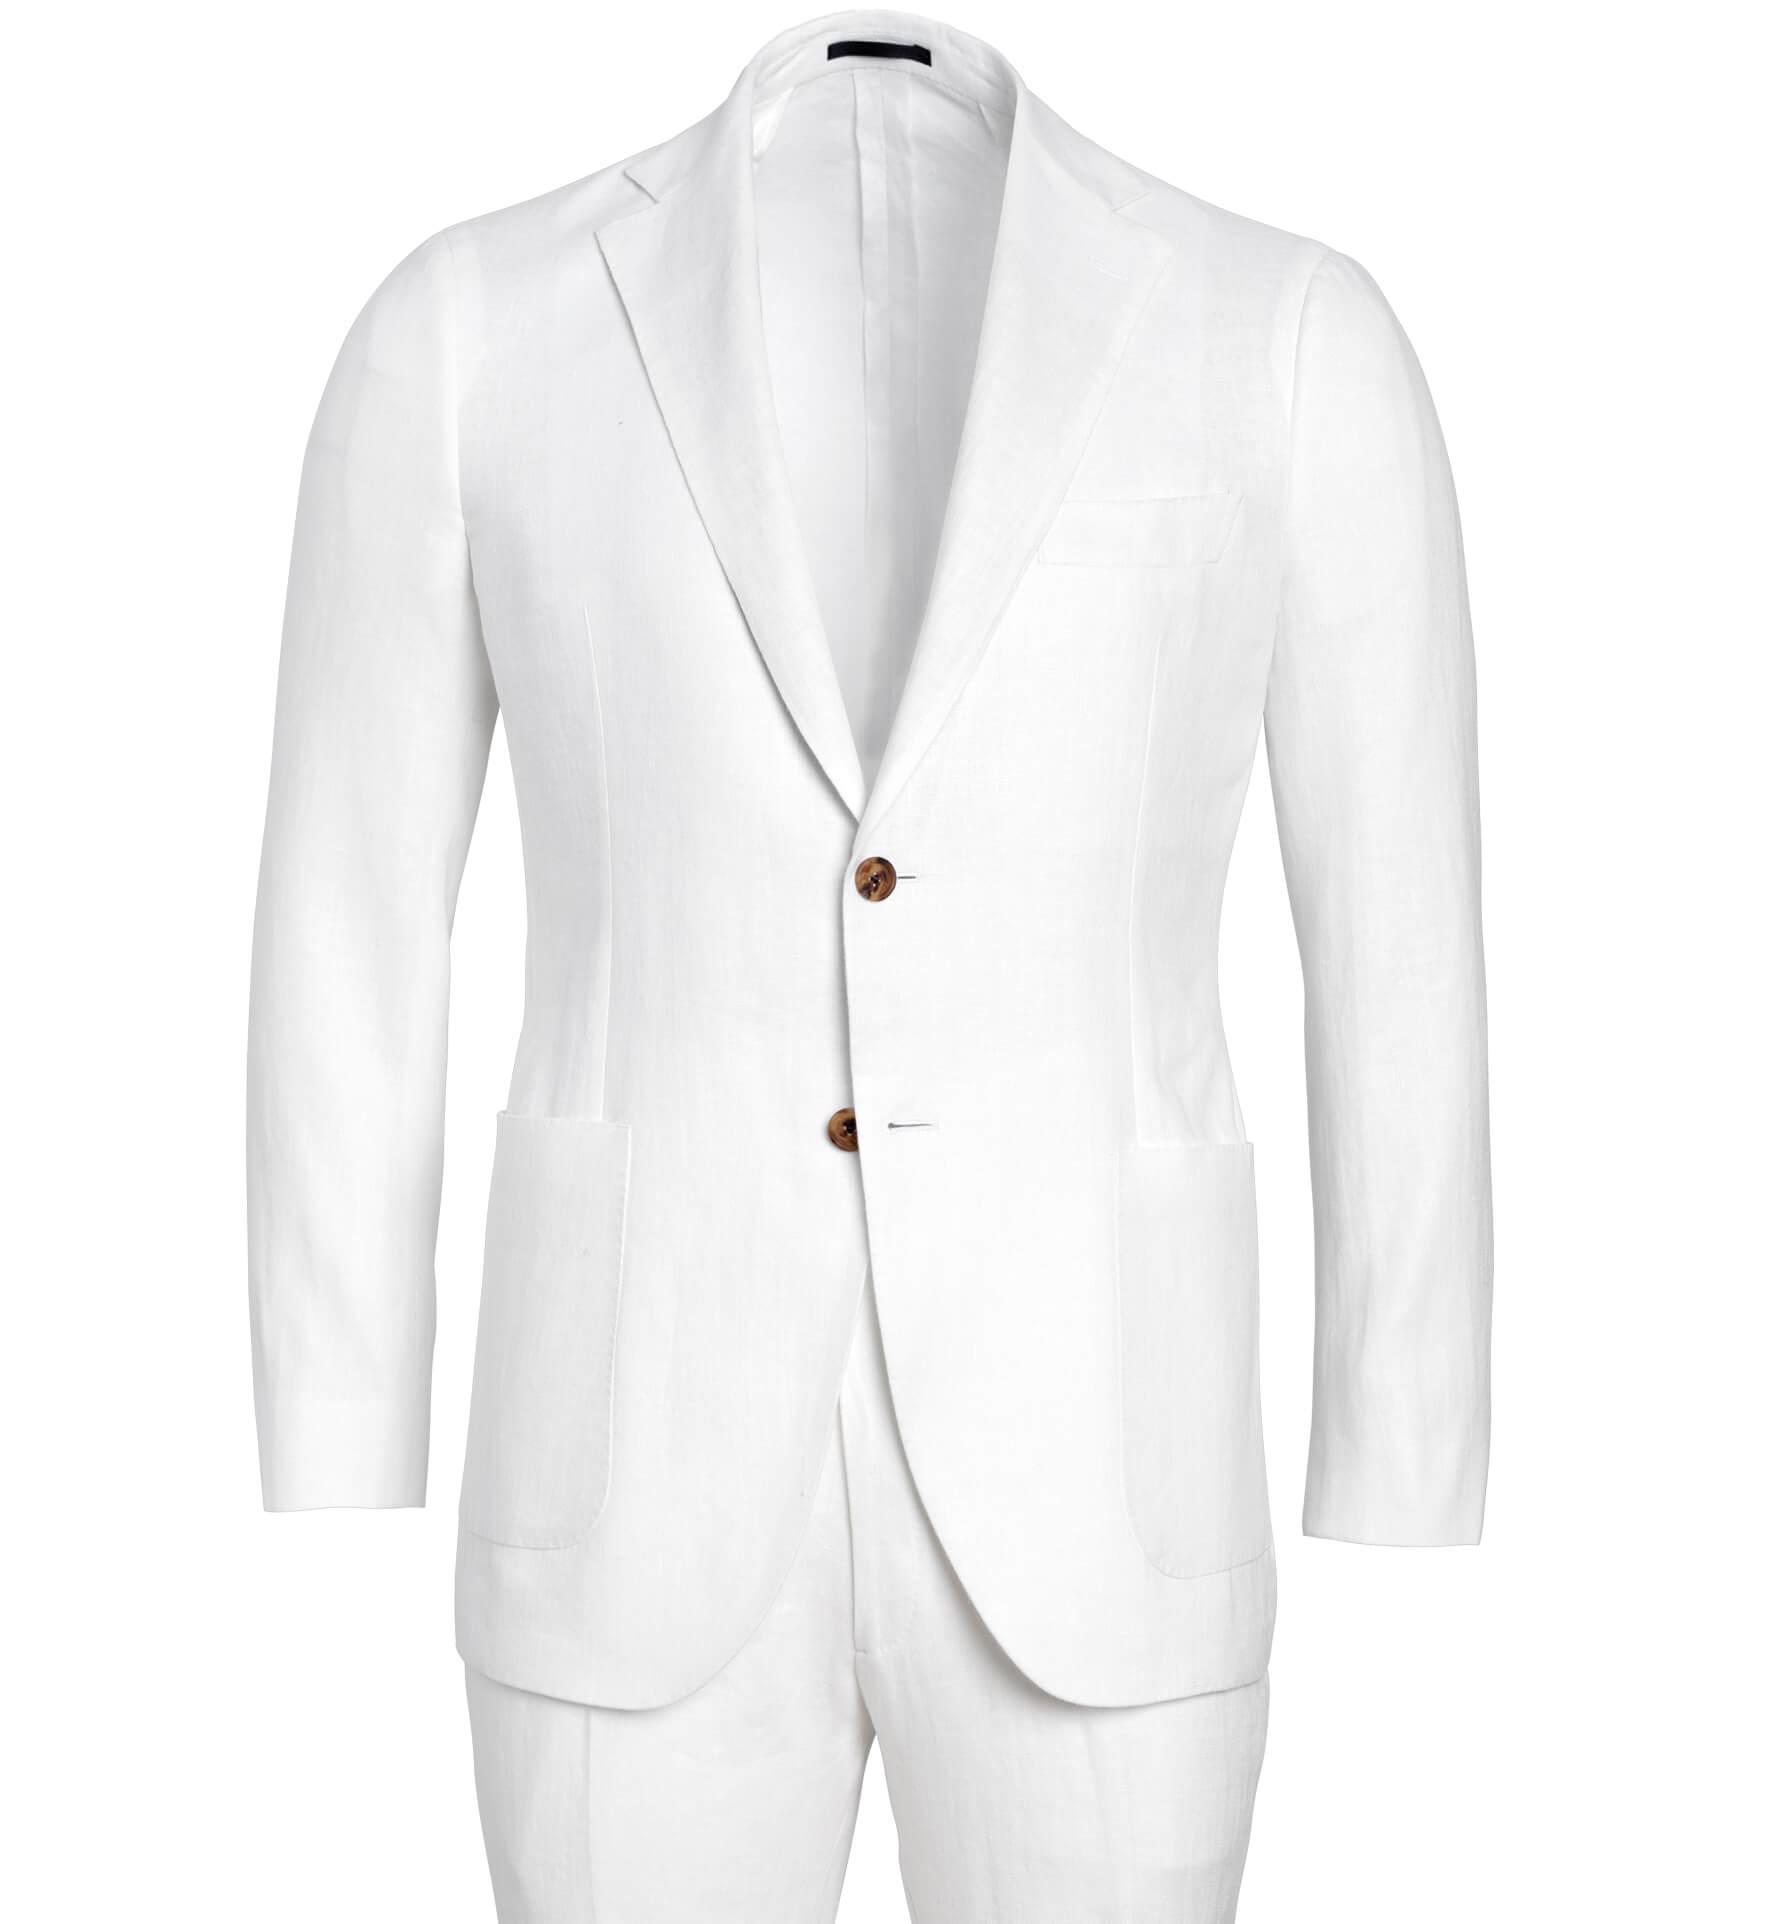 Zoom Image of Bedford White Irish Linen Suit